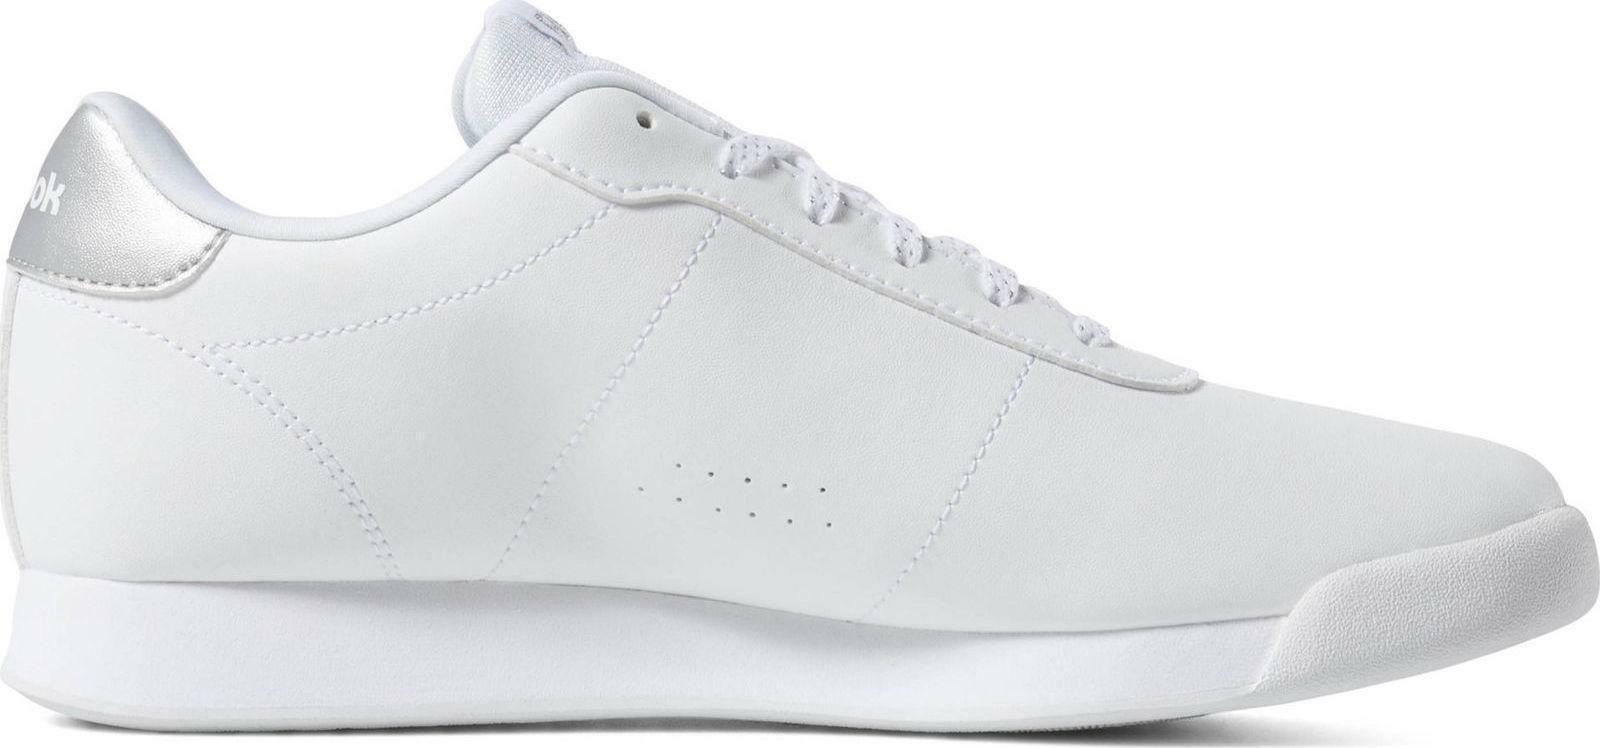 reebok royal charm donna sneaker sportiva dv4186 bianco